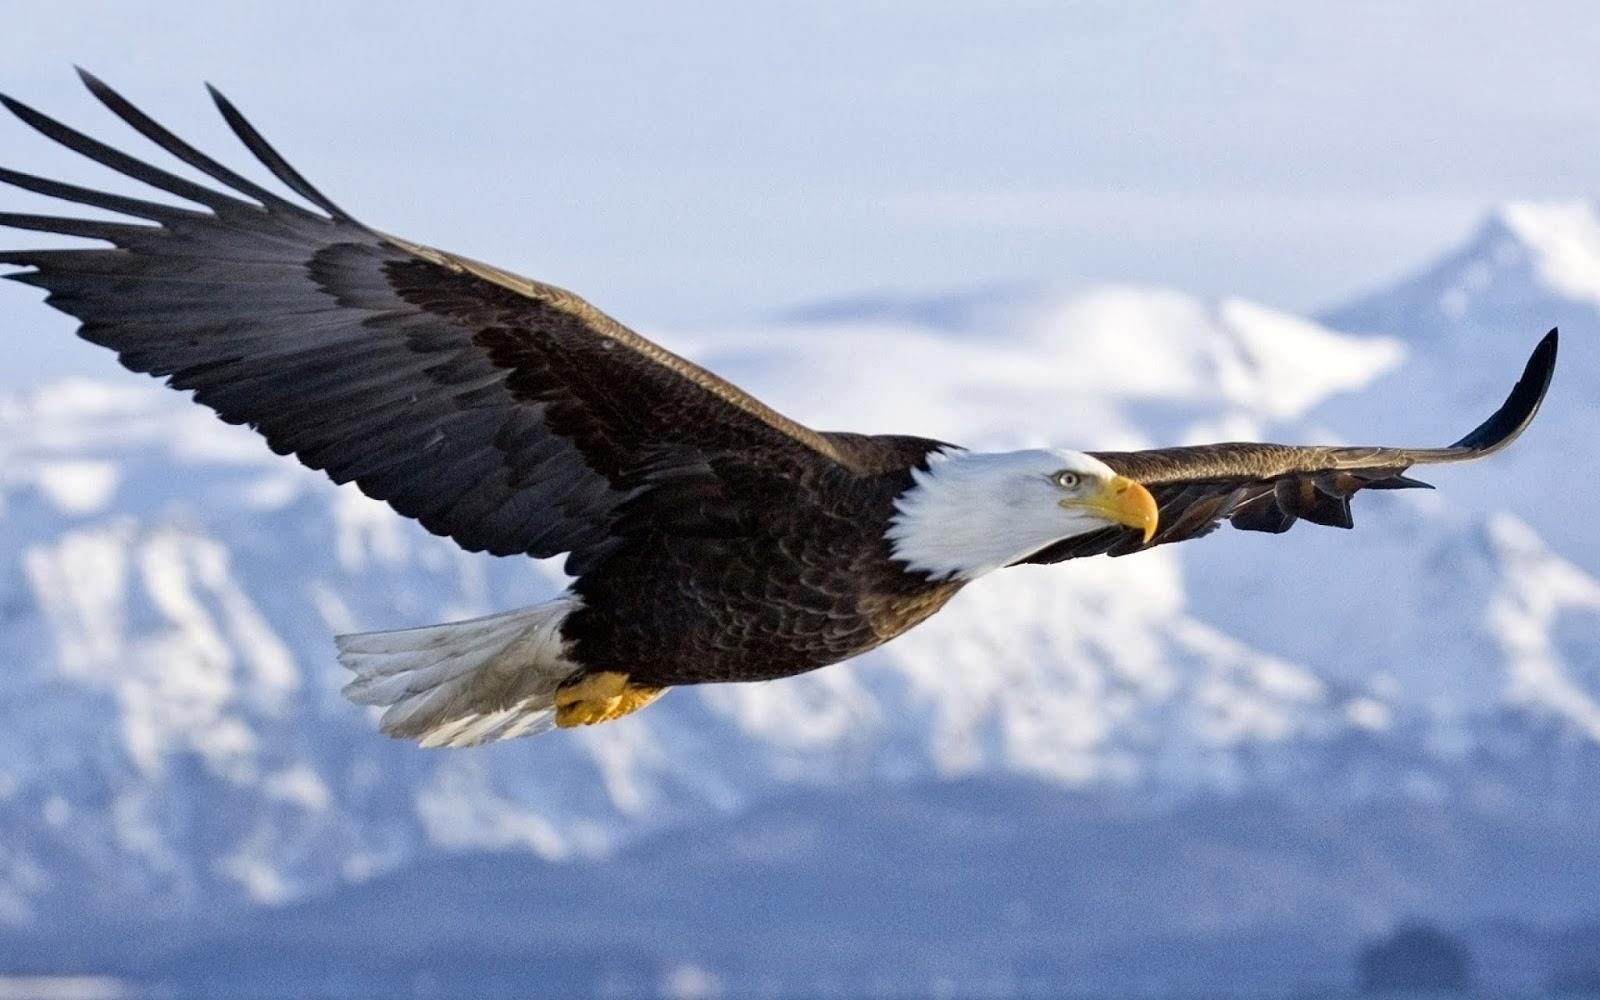 Beautiful HD Wallpapers 4 u Download 3D Flying Bald Eagle HD 1600x1000